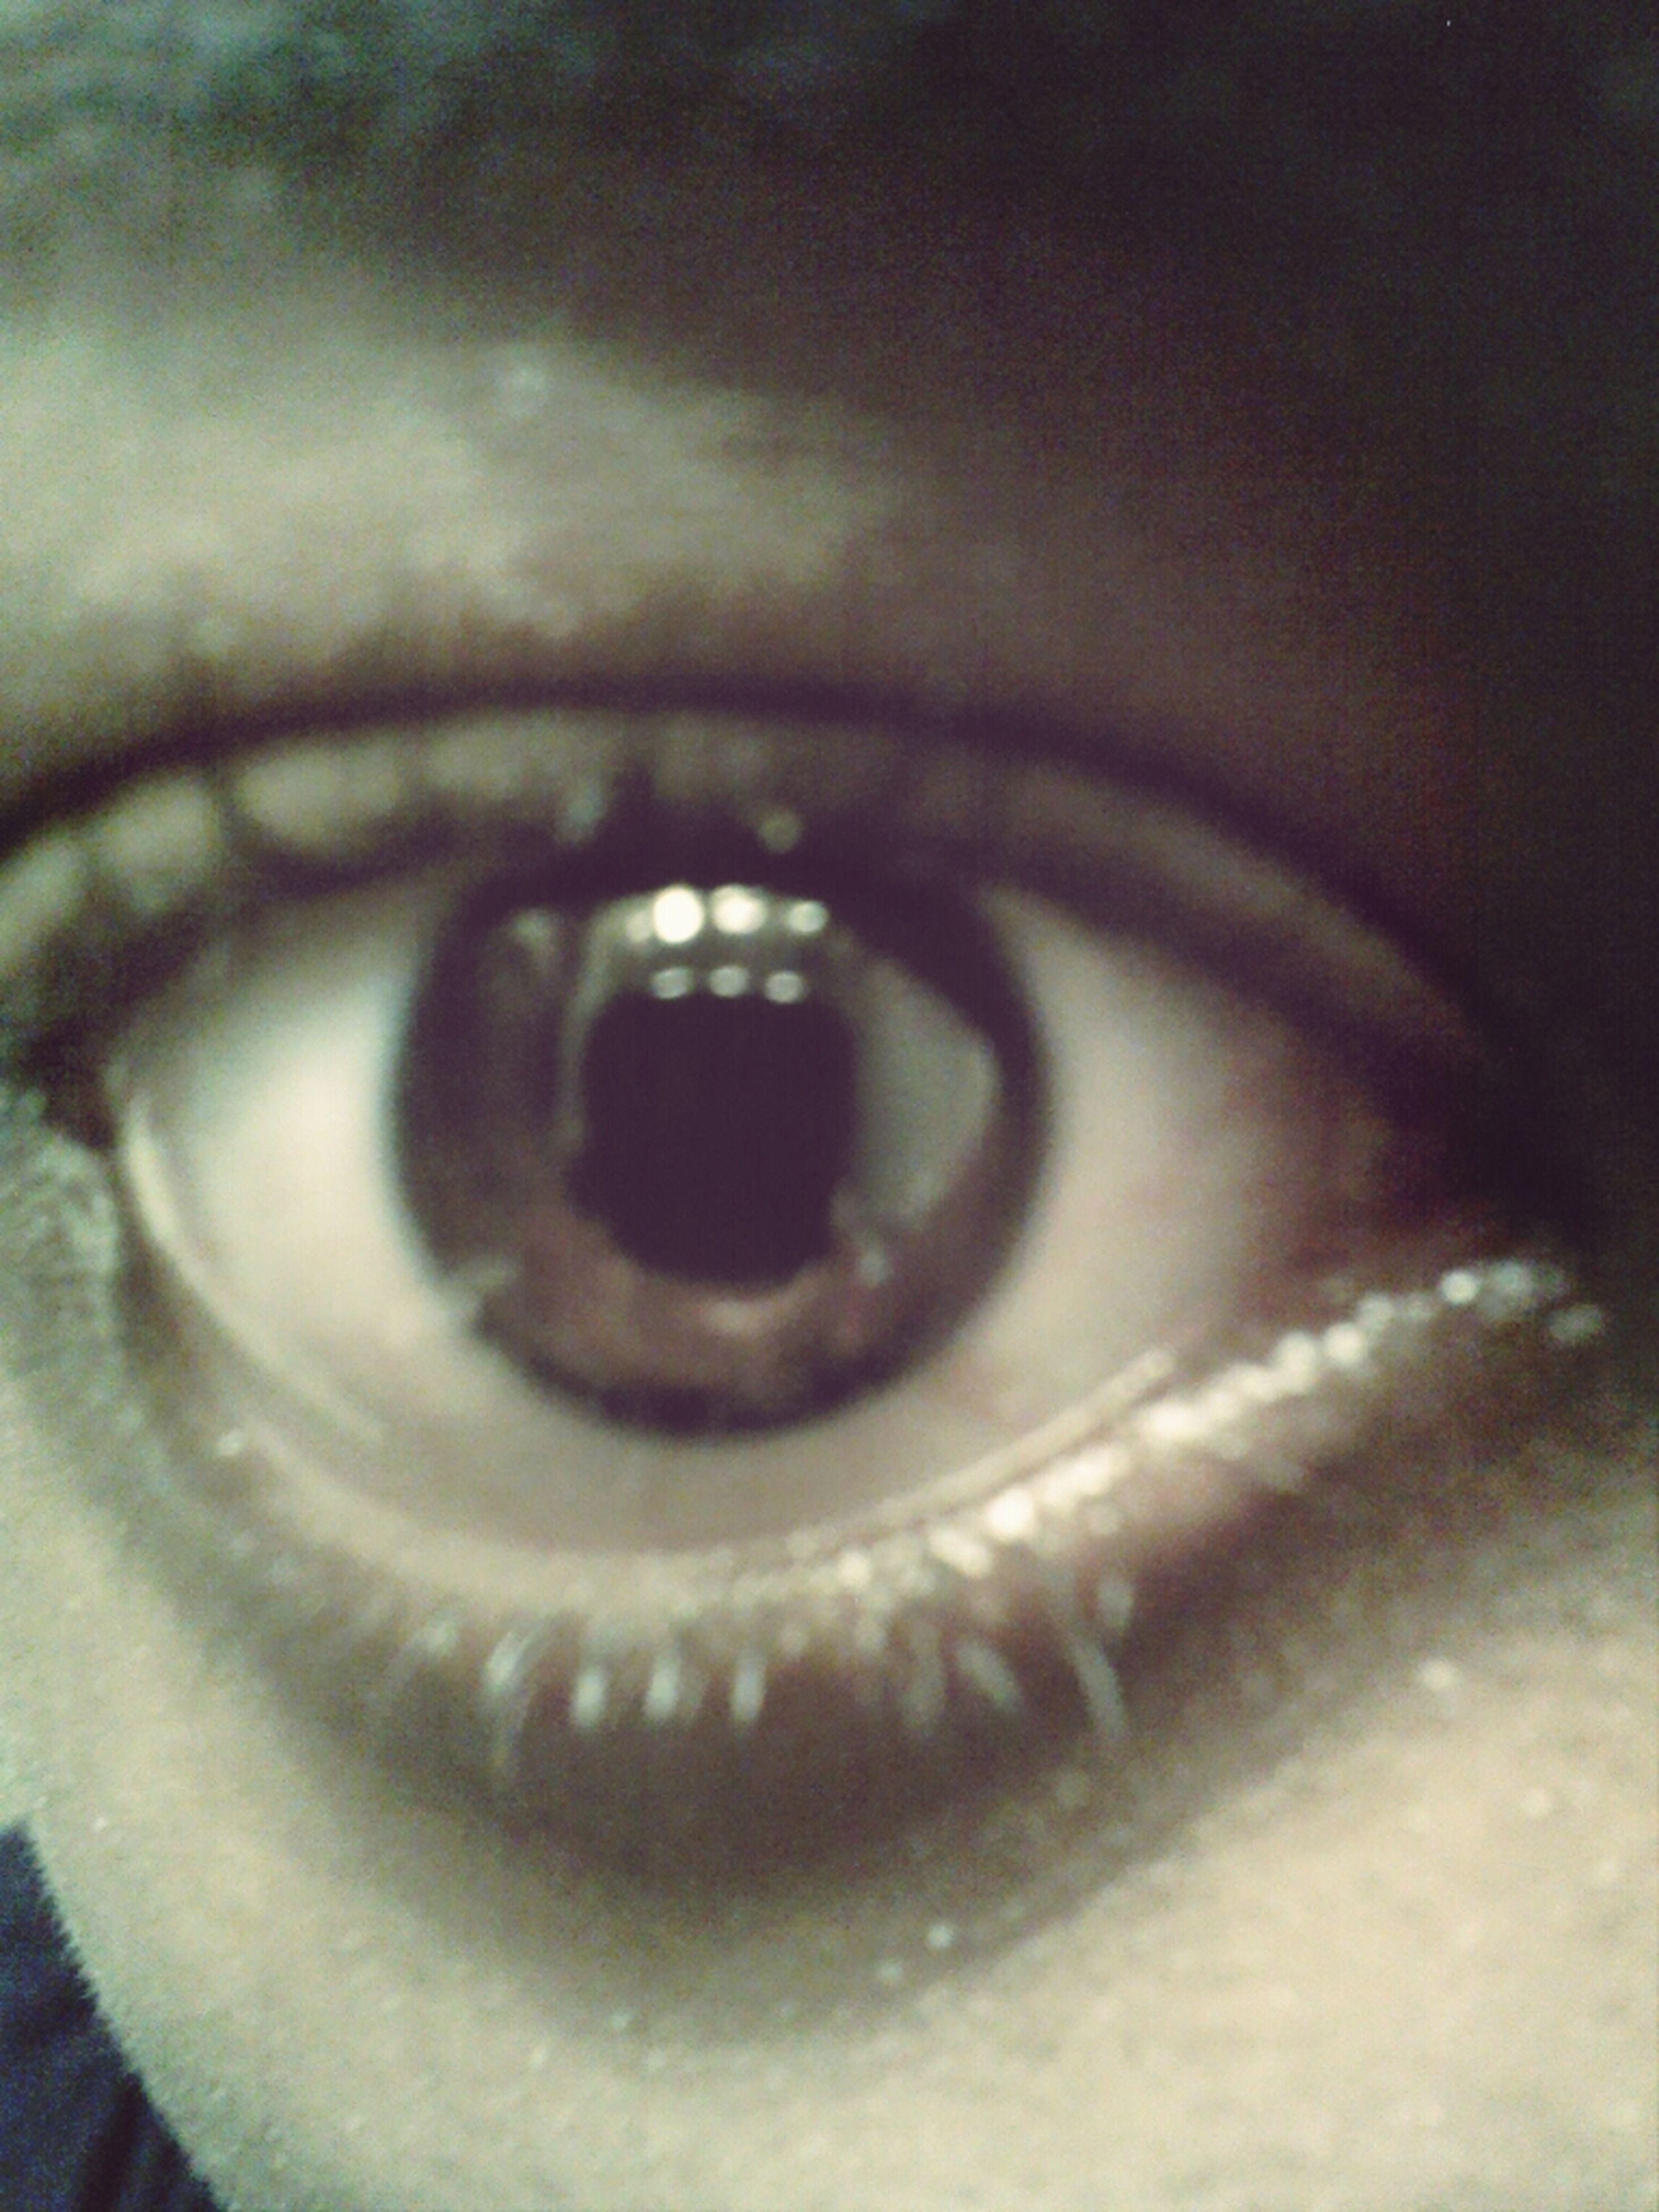 human eye, close-up, eyelash, extreme close-up, eyesight, sensory perception, indoors, extreme close up, part of, full frame, human skin, detail, selective focus, macro, iris - eye, eyeball, unrecognizable person